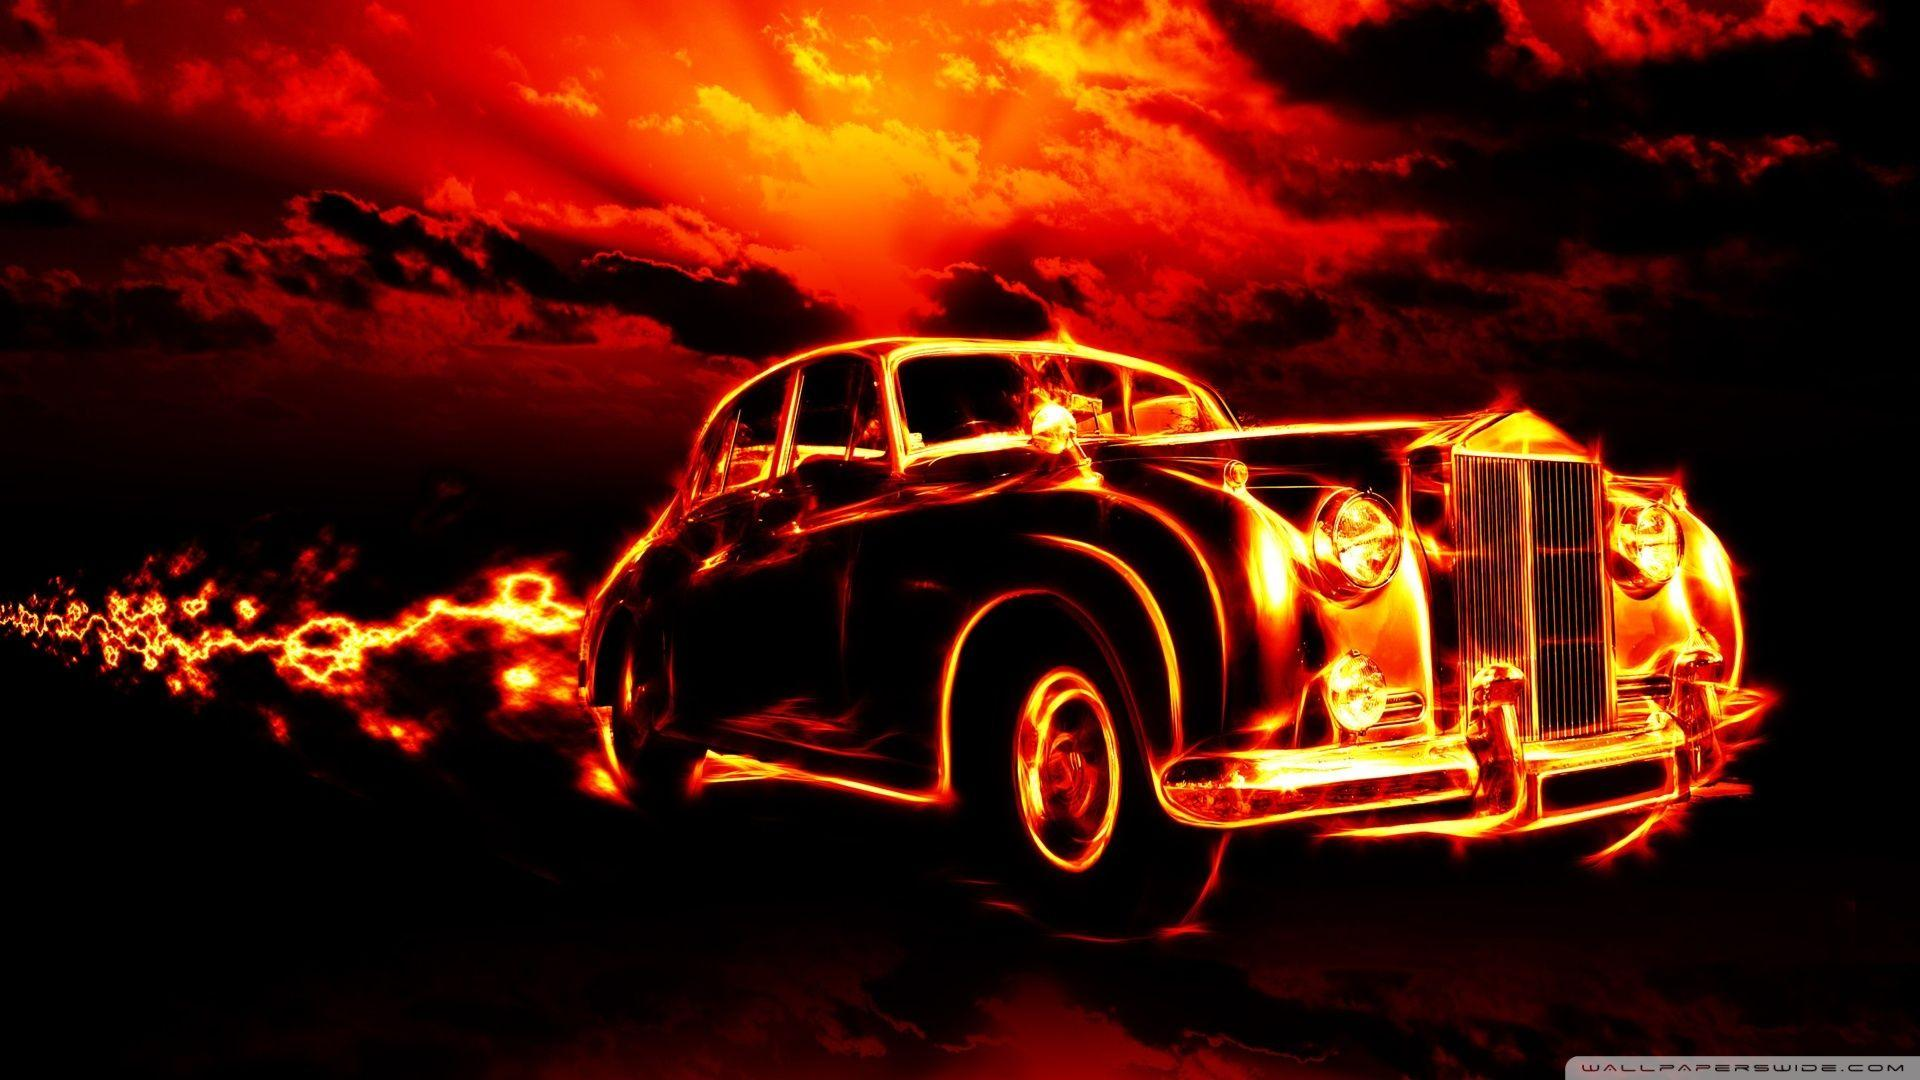 Fire Car Wallpapers Wallpaper Cave